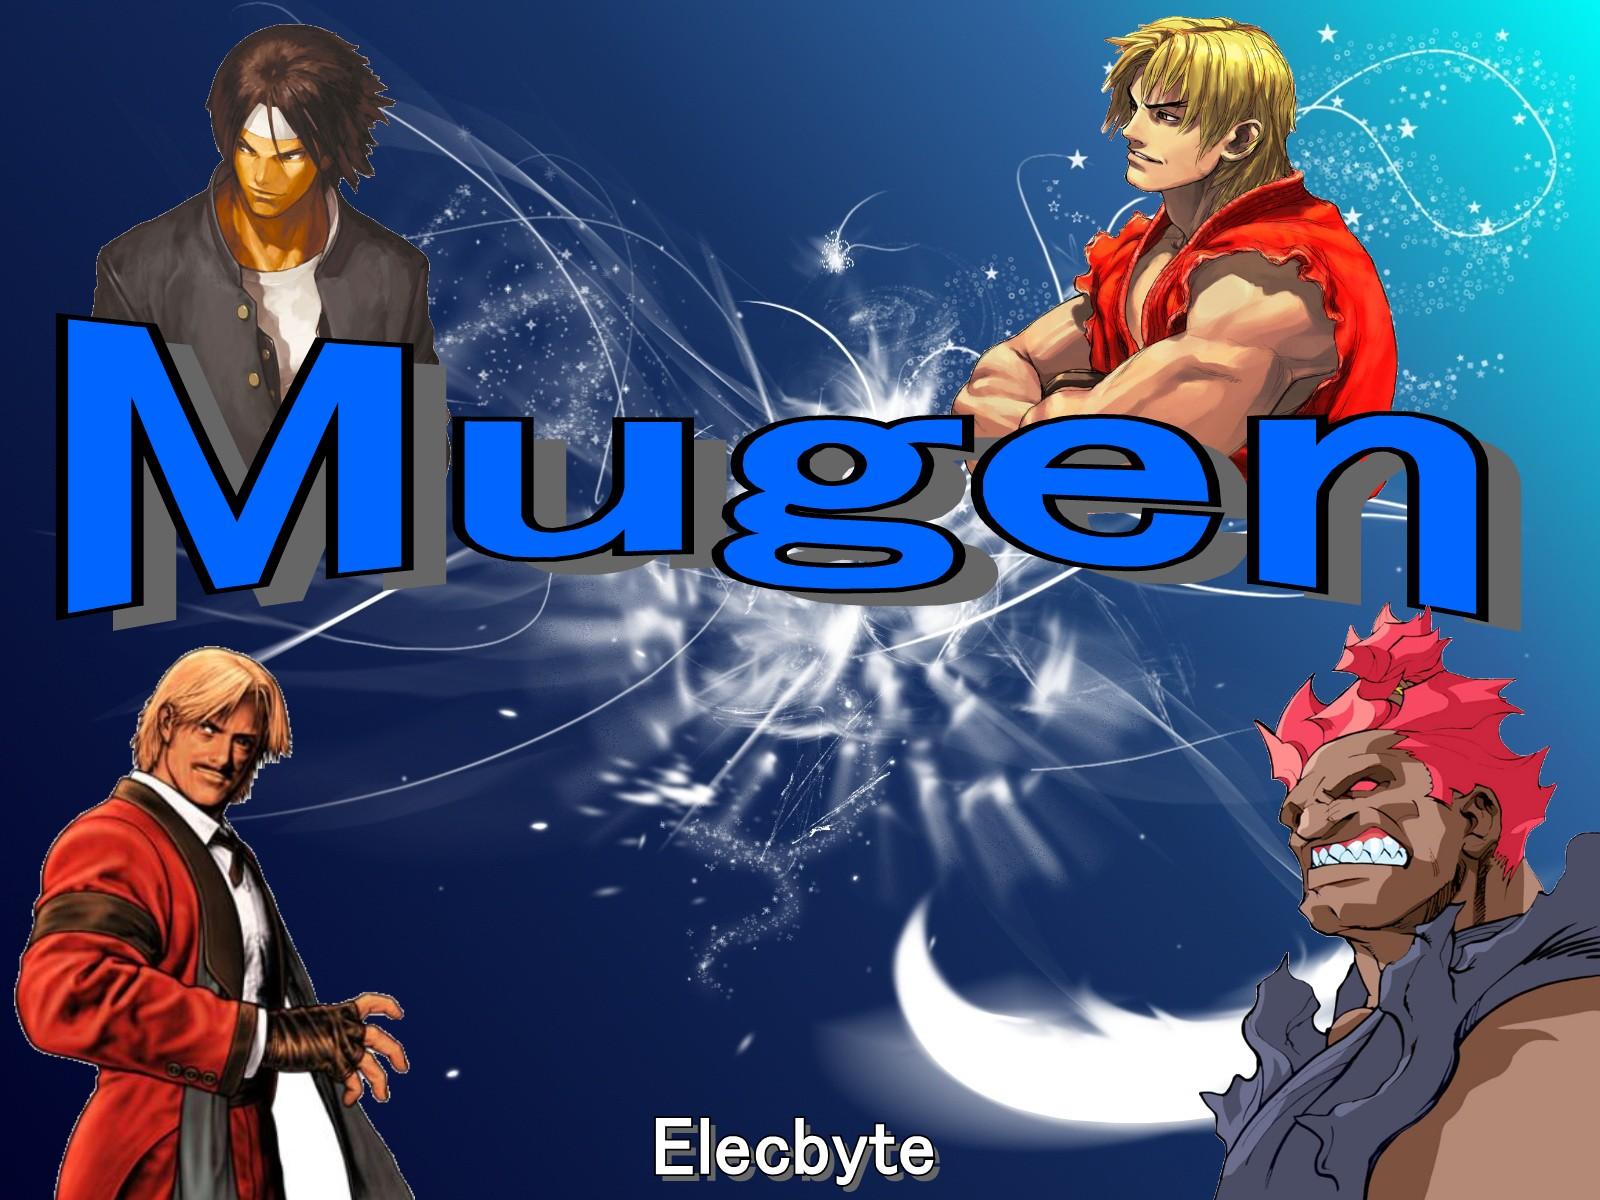 Mugen all characters battle zero screenpack download.